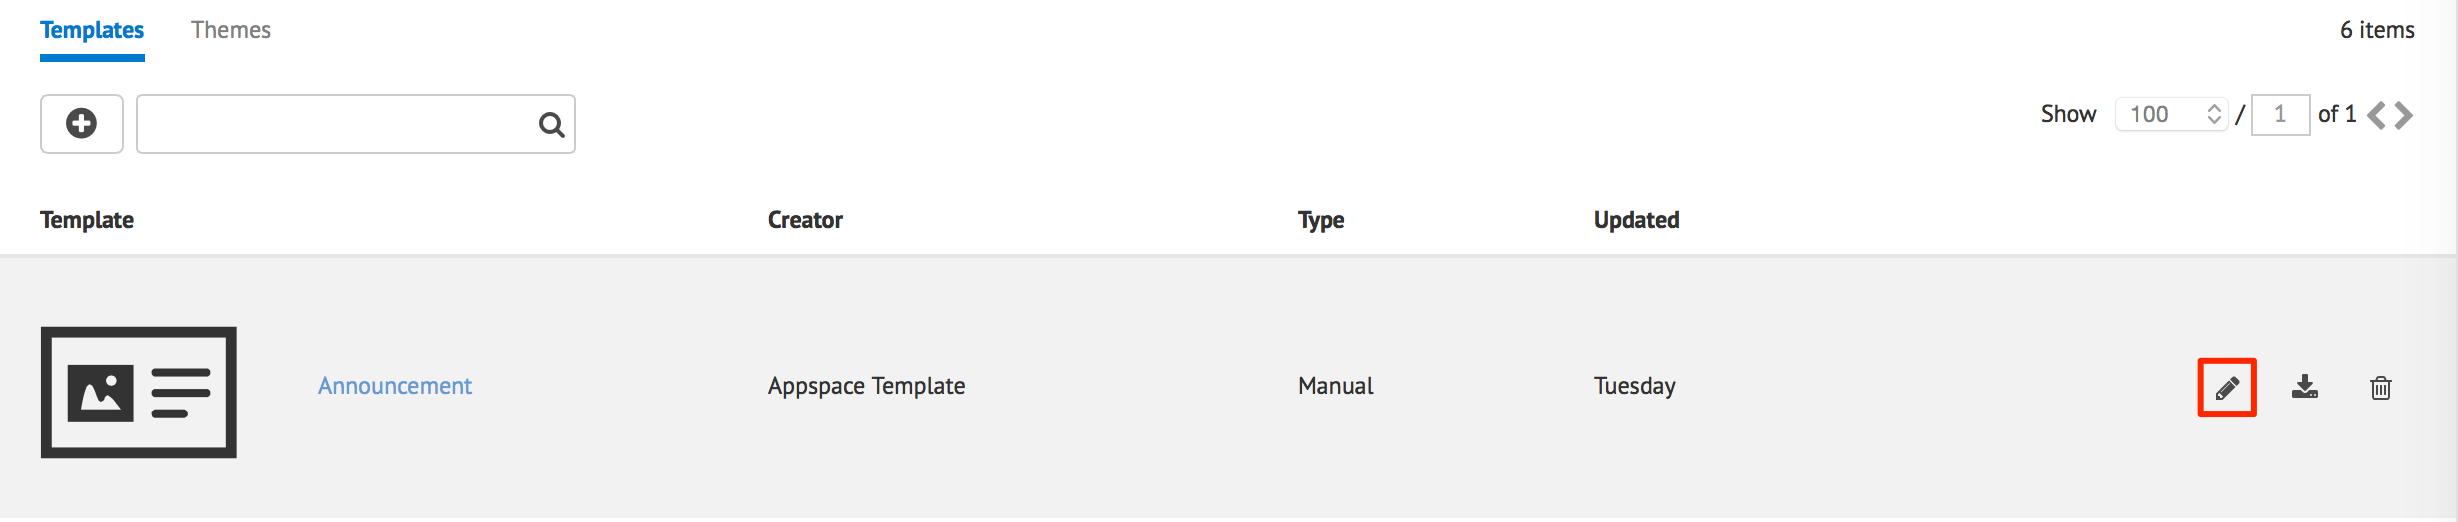 Adding A Card Template Appspace V6 3 Documentation